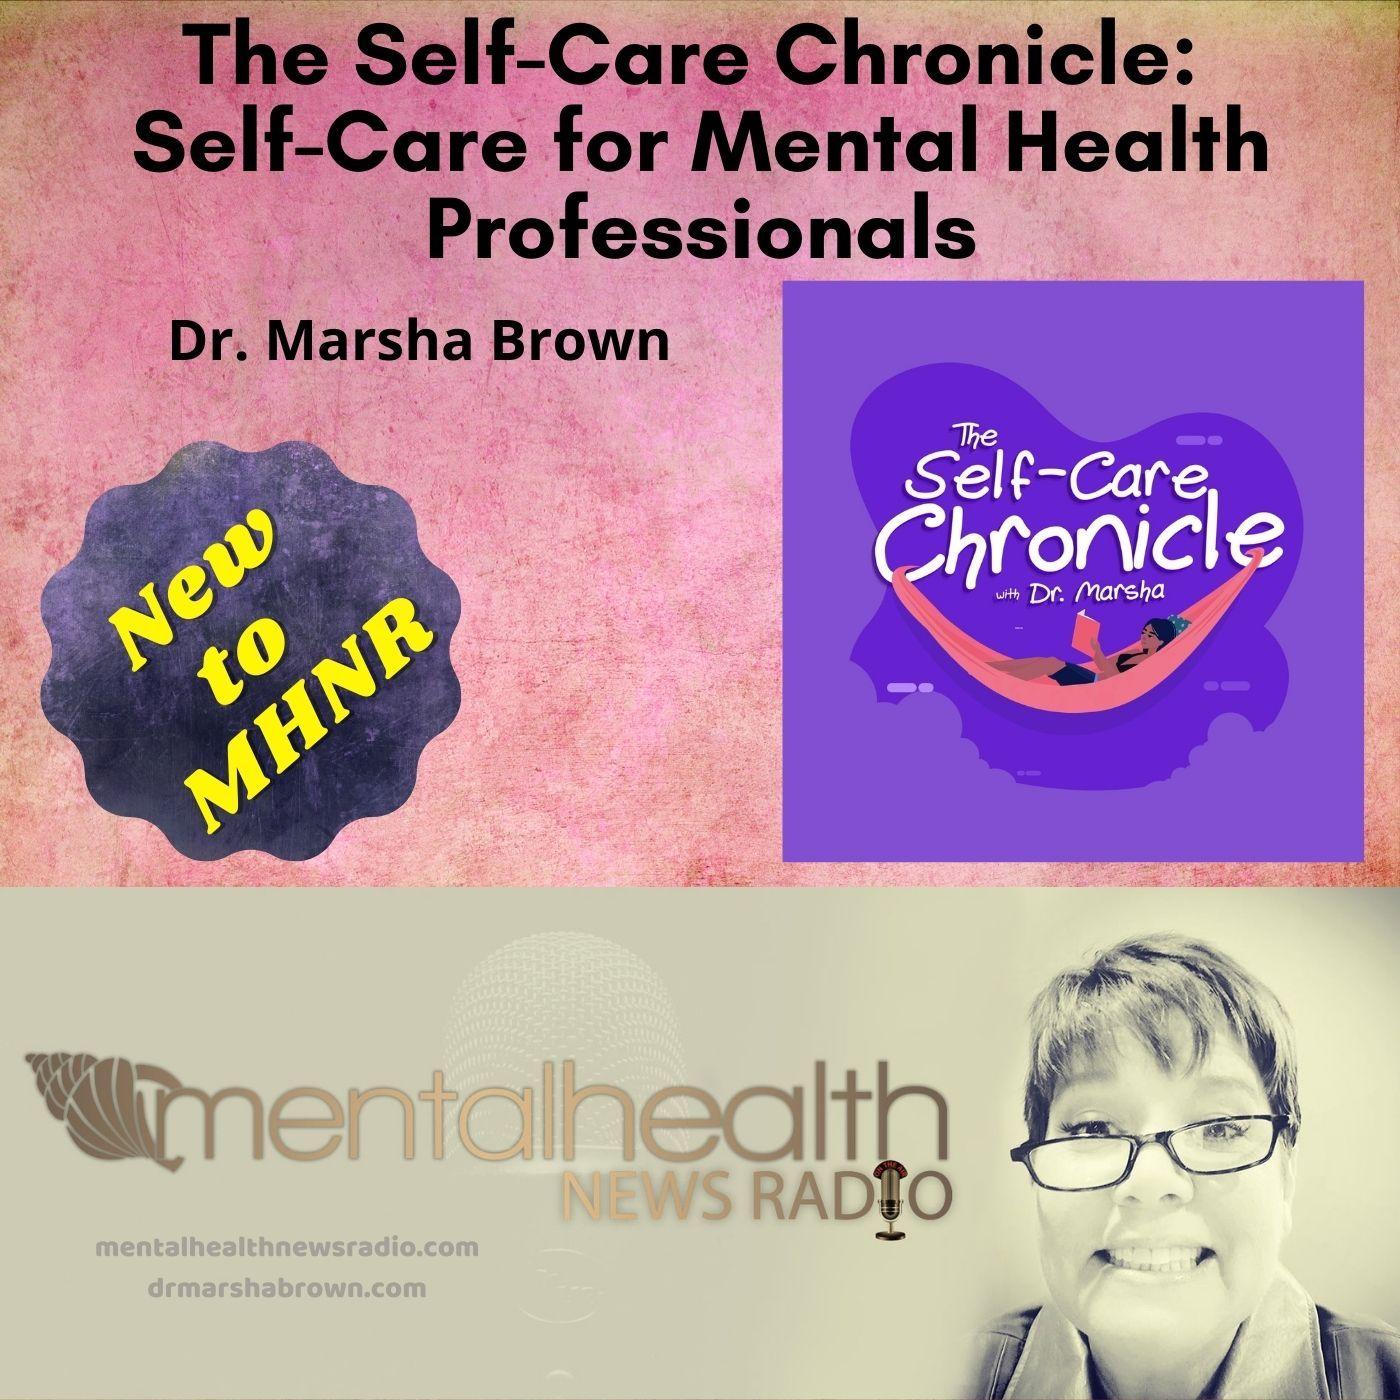 Mental Health News Radio - The Self-Care Chronicle:  Self-Care for Mental Health Professionals